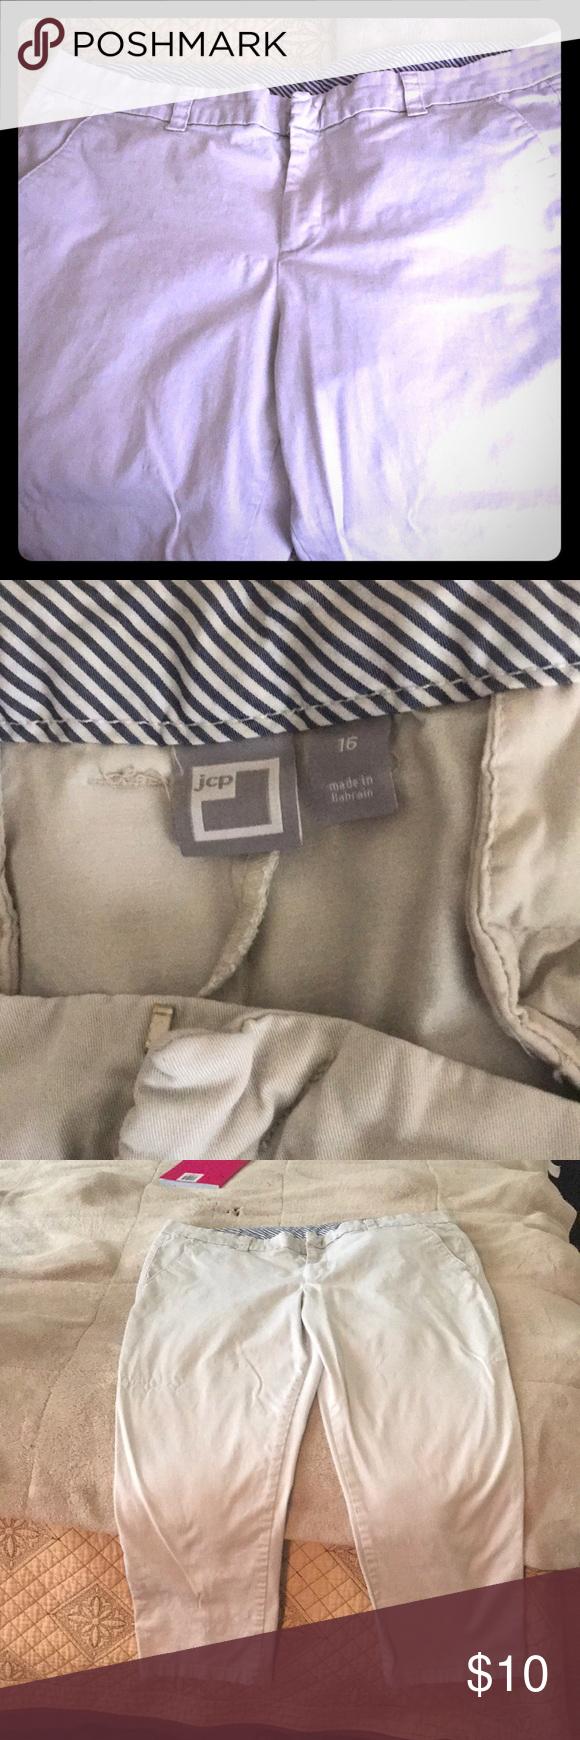 eebd386d1b9b5 Women s jCP Size 16 capris Gently used capris jcpenney Pants Capris ...